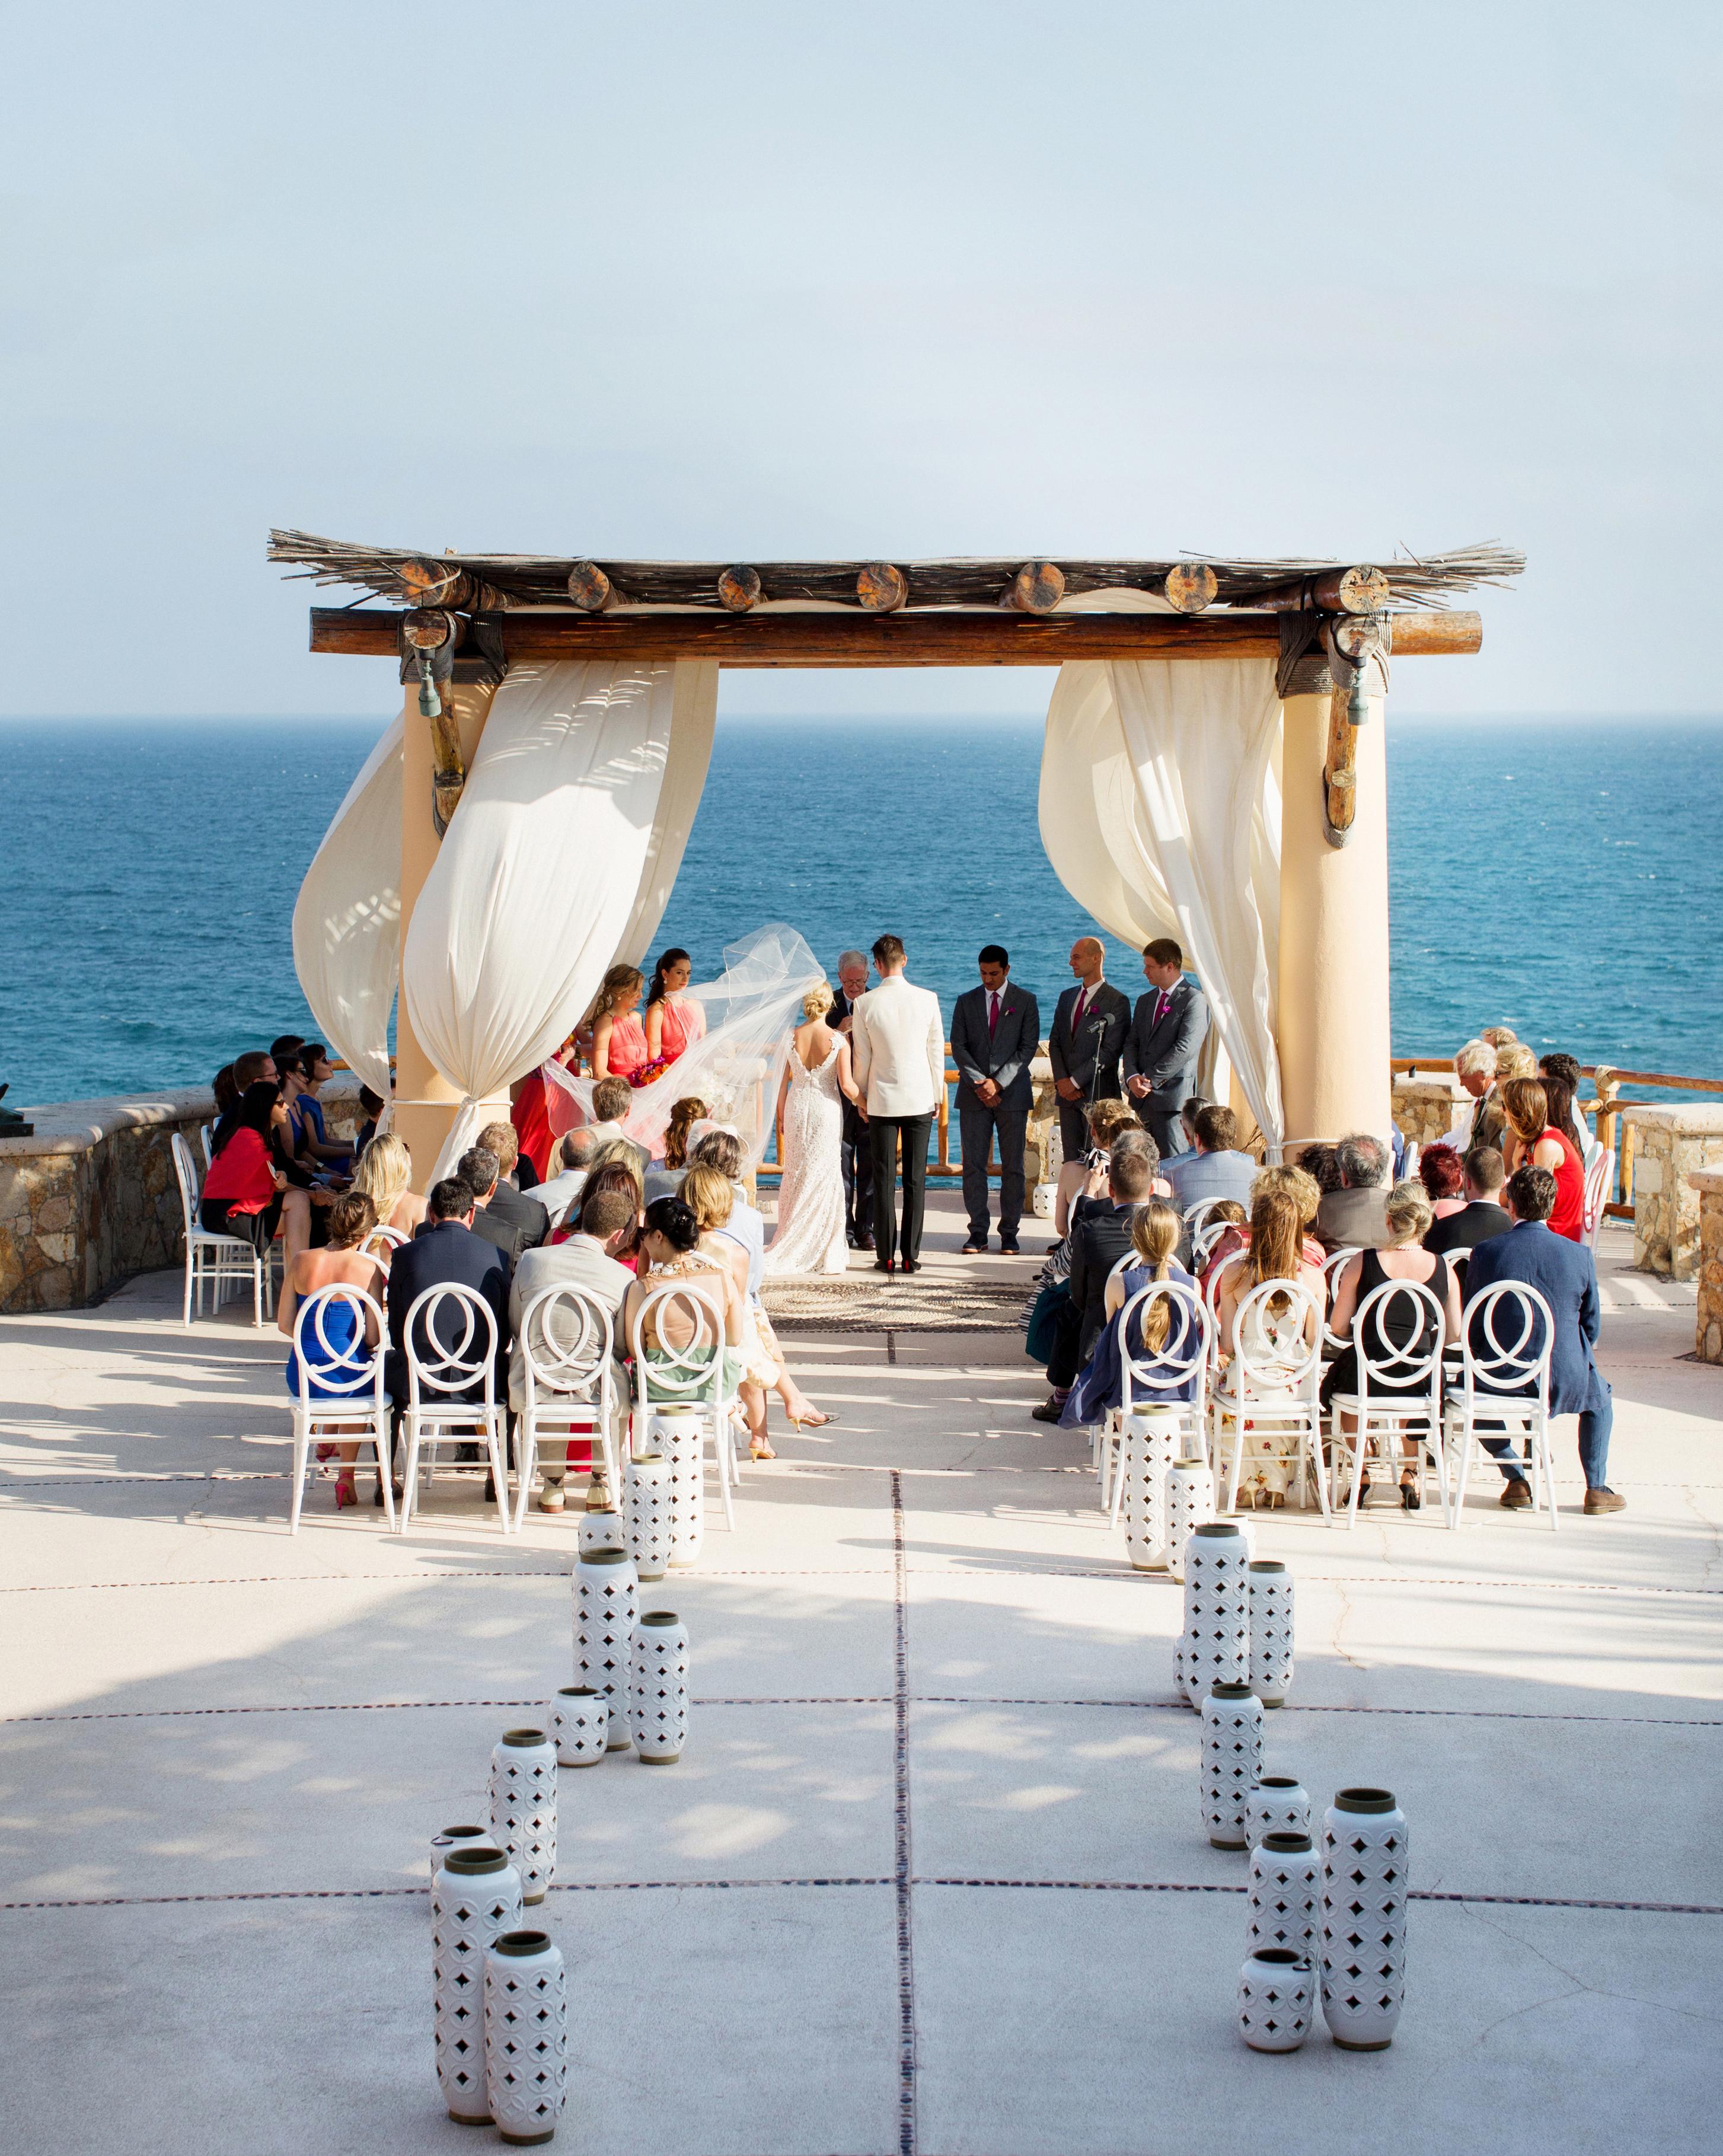 veronica-mathieu-wedding-ceremony-0862-s111501-1014.jpg